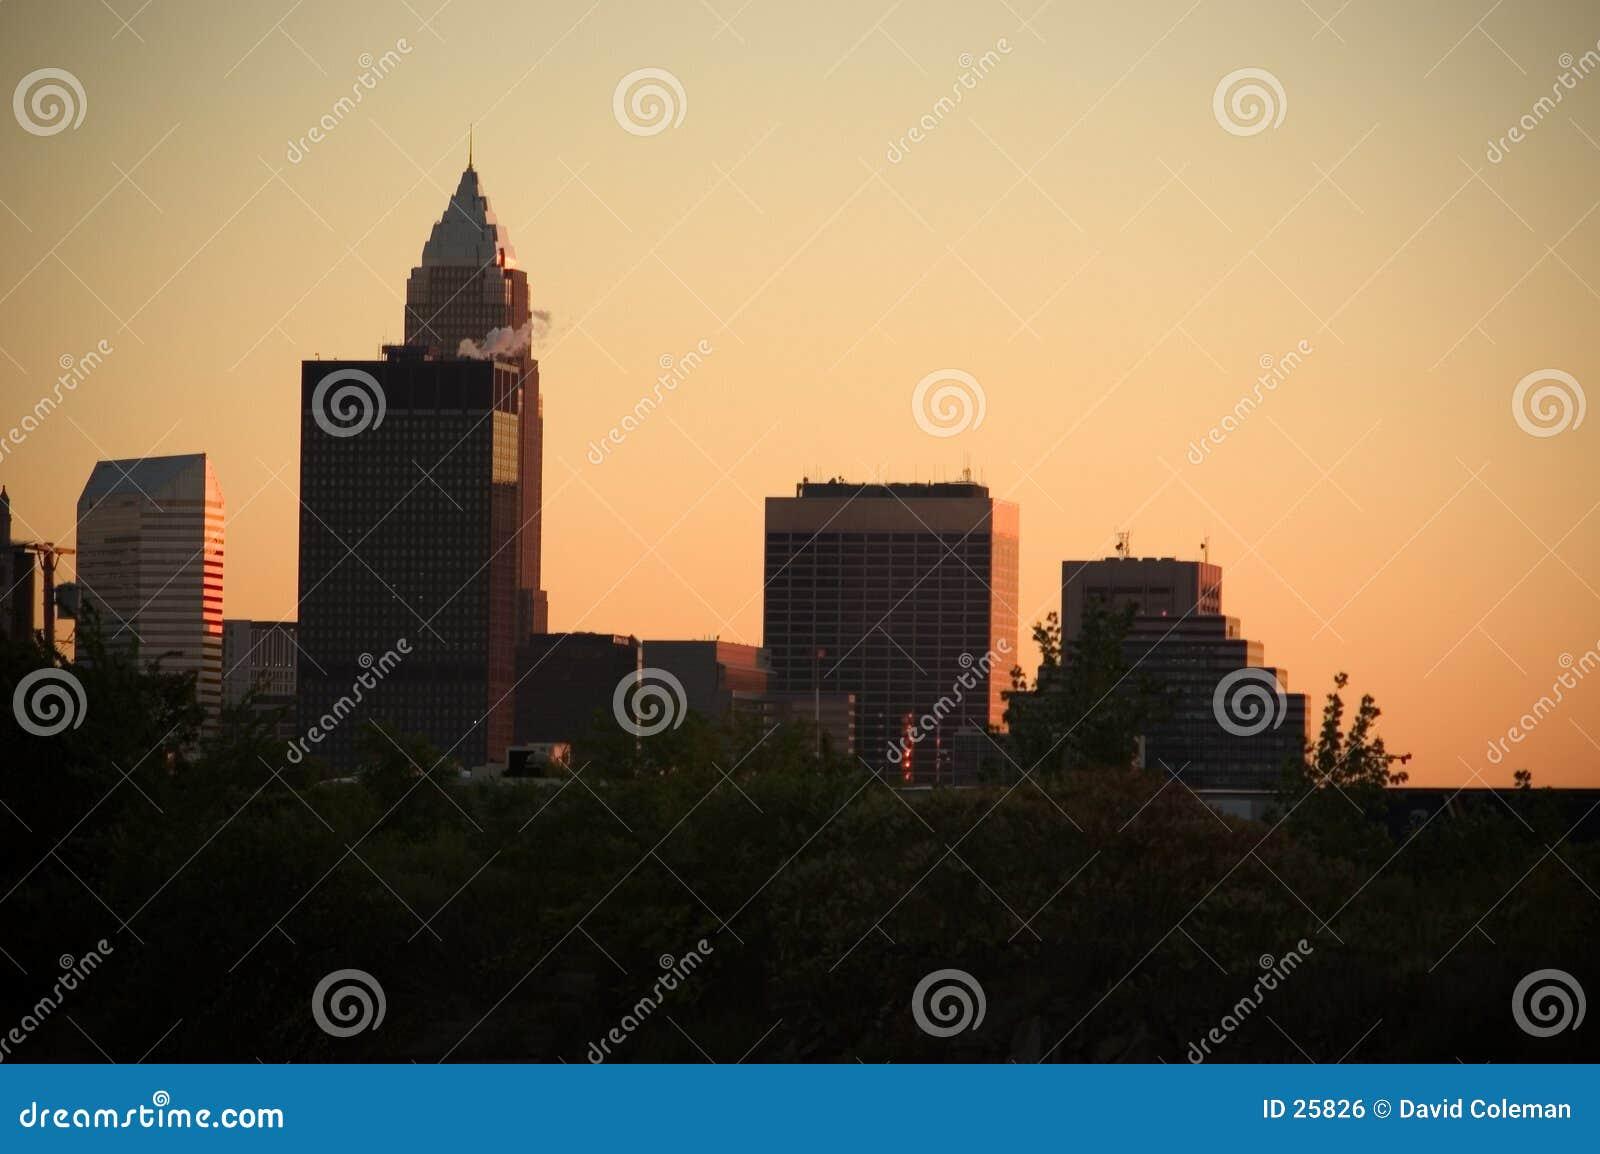 Stadtzentrum am Sonnenuntergang